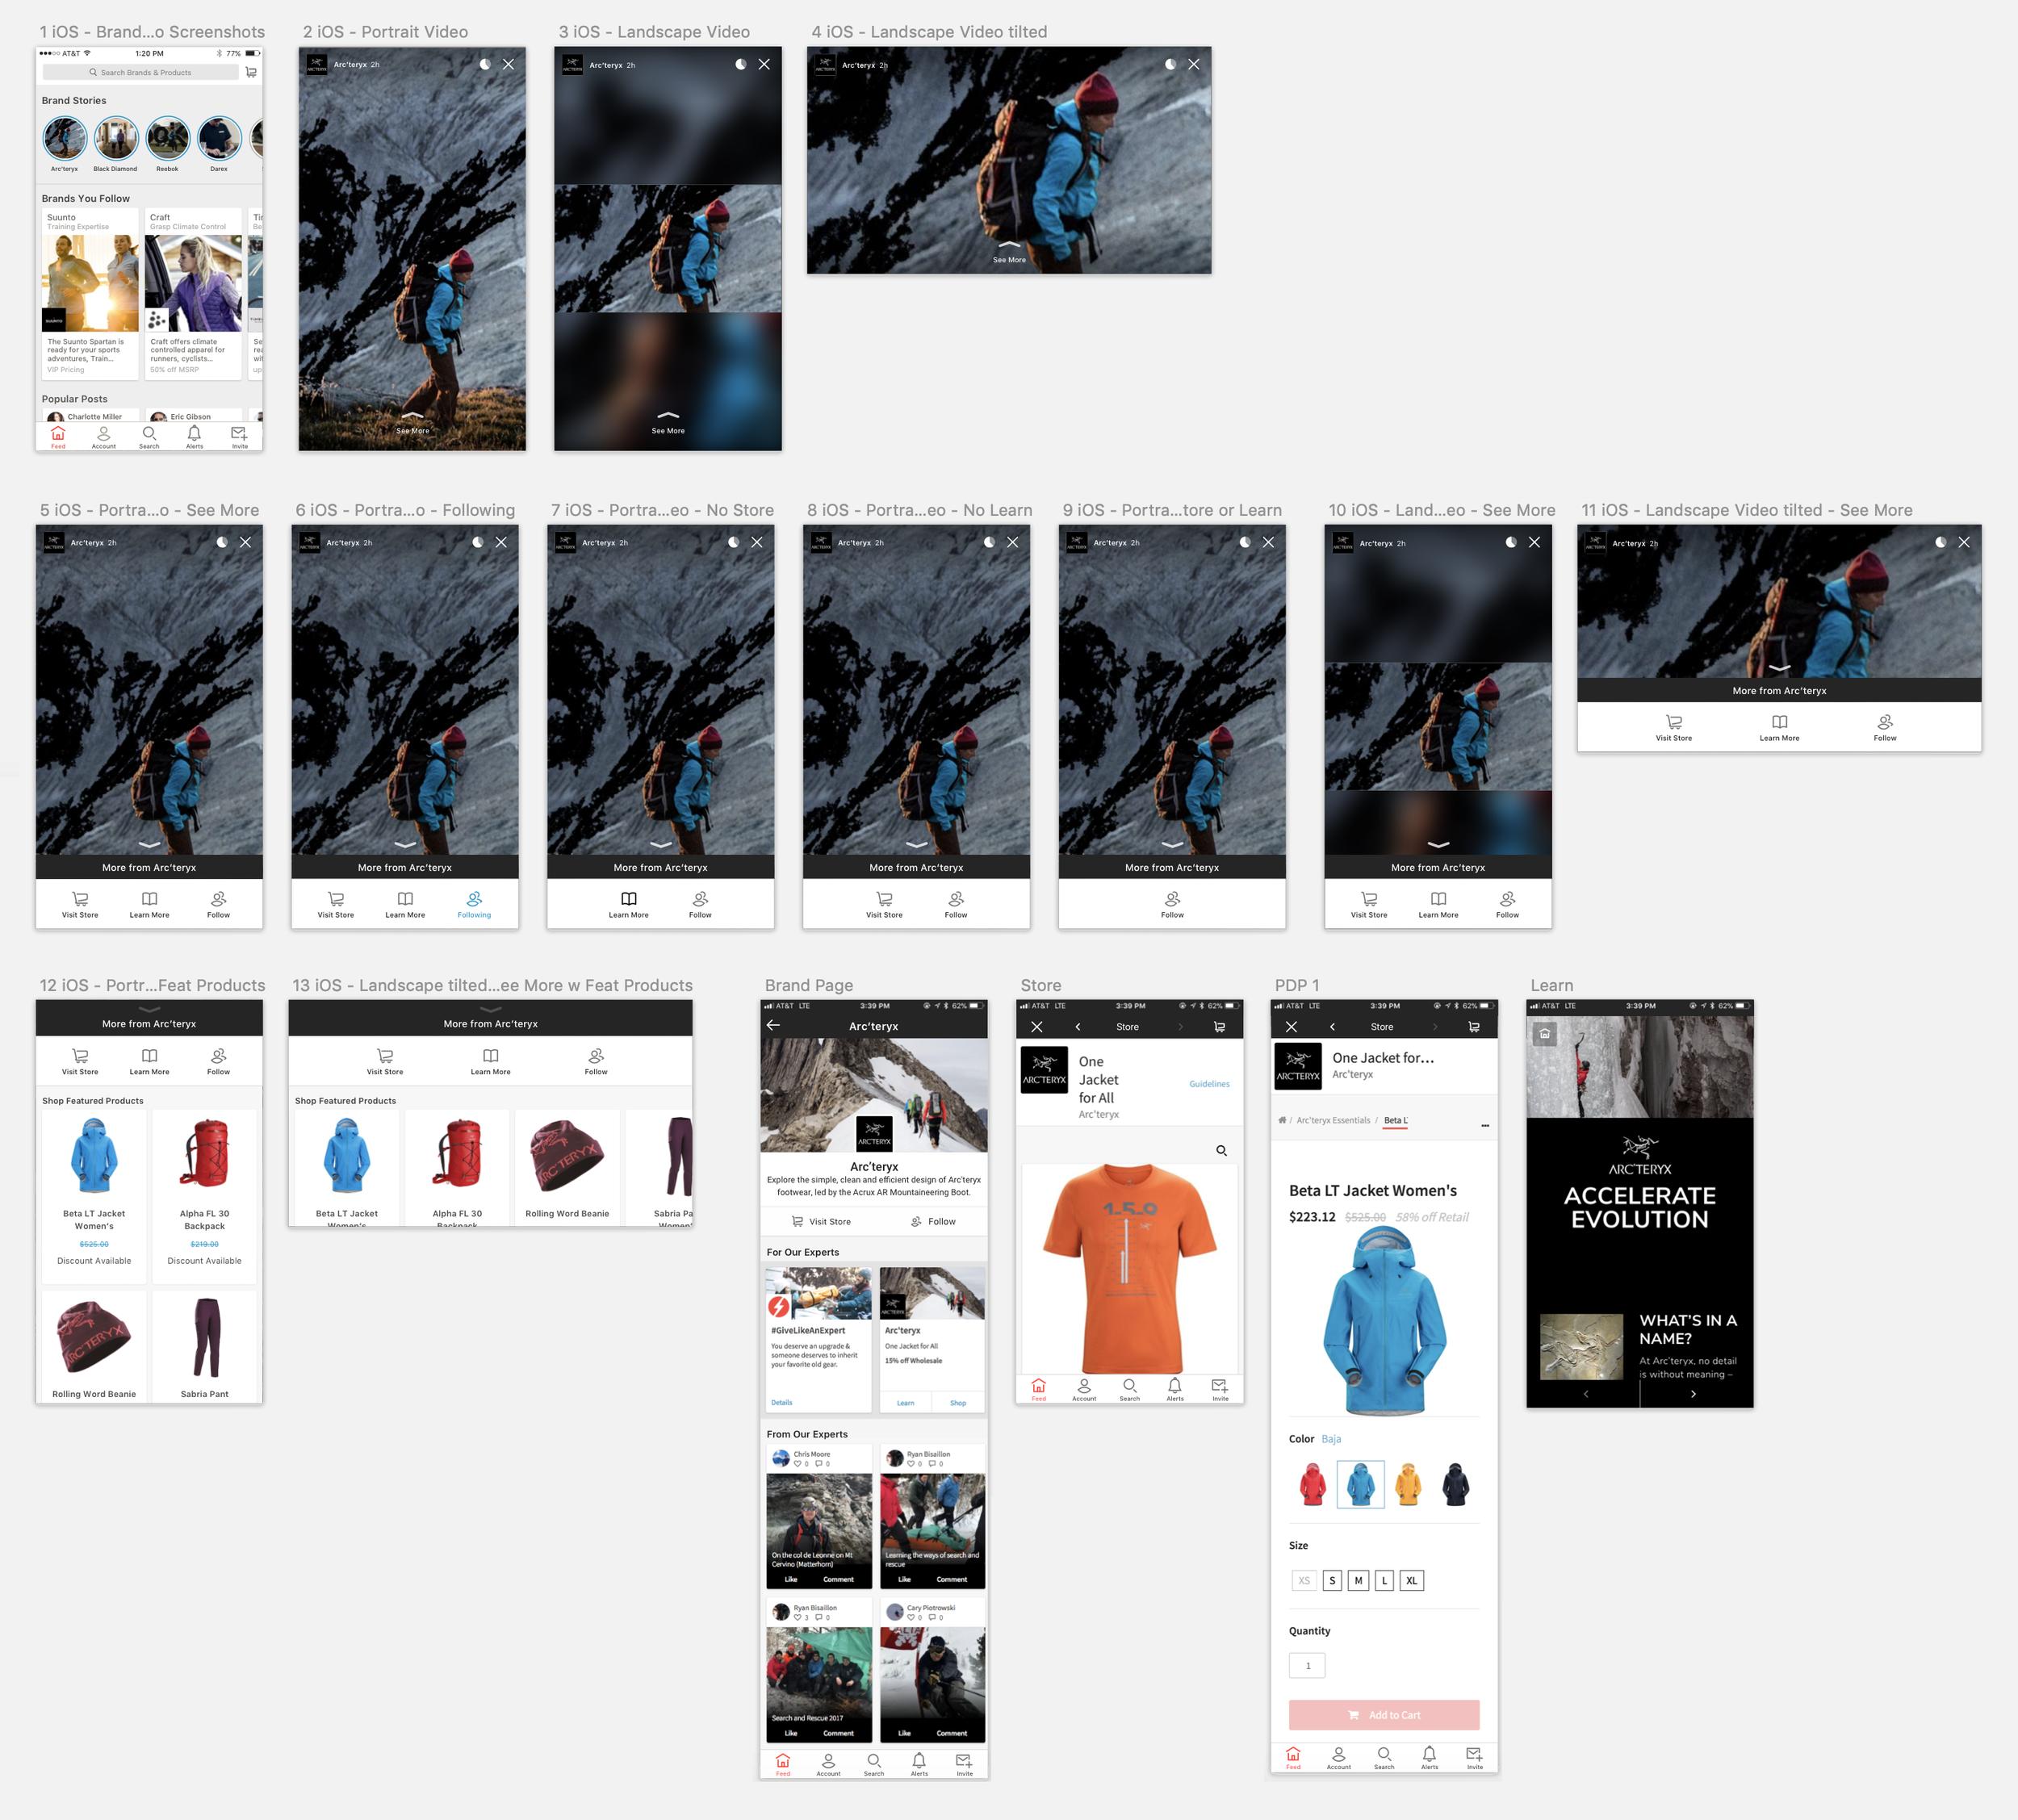 Brand Stories_v2.png